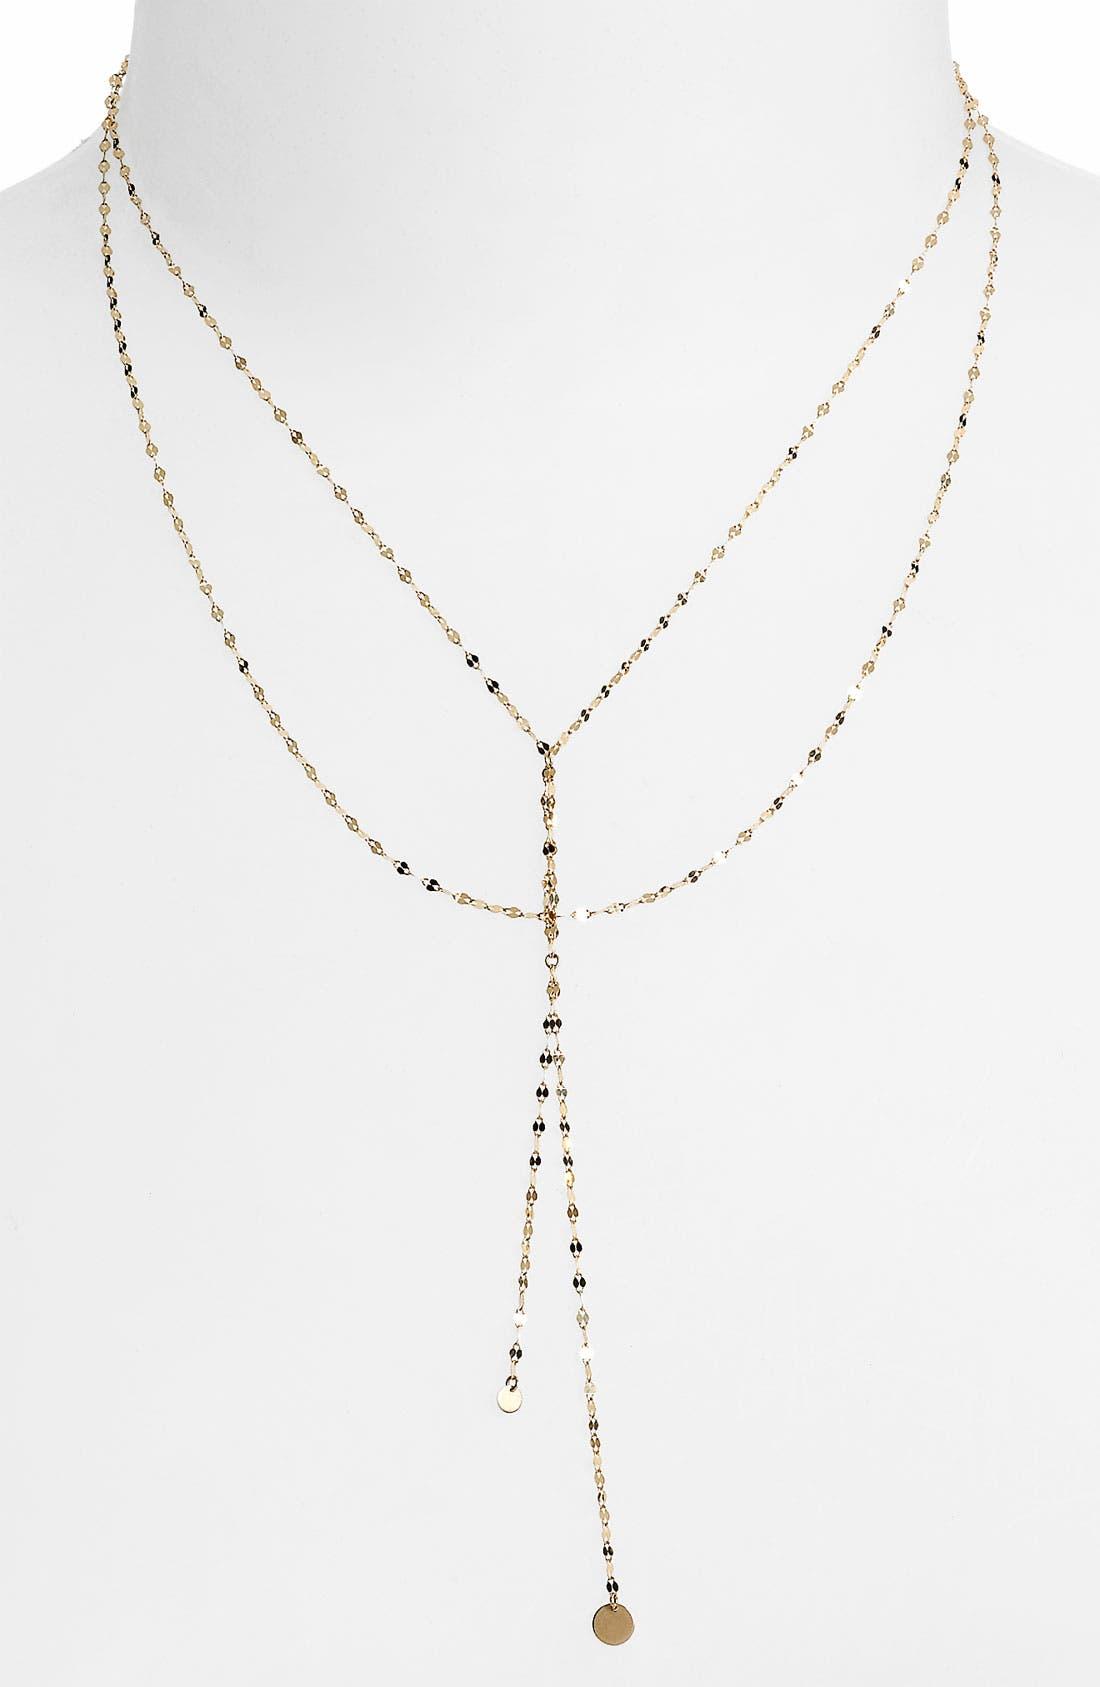 Alternate Image 1 Selected - Lana Jewelry 'Petite Blake' Lariat Necklace